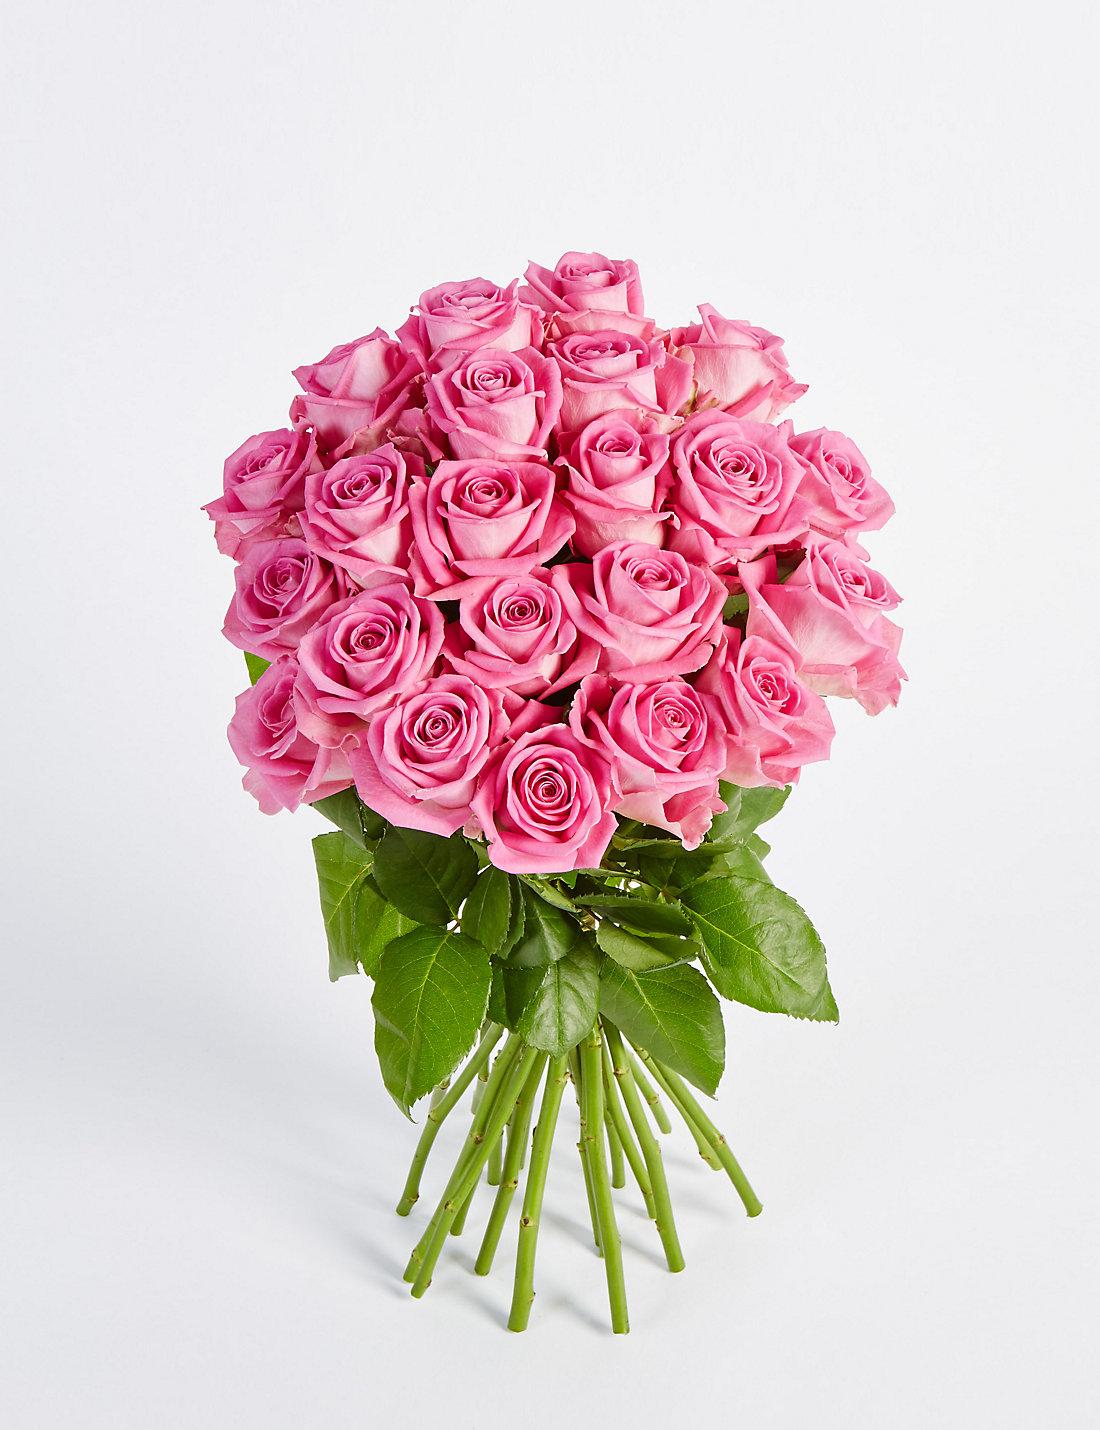 Pink Roses Images Sf Wallpaper